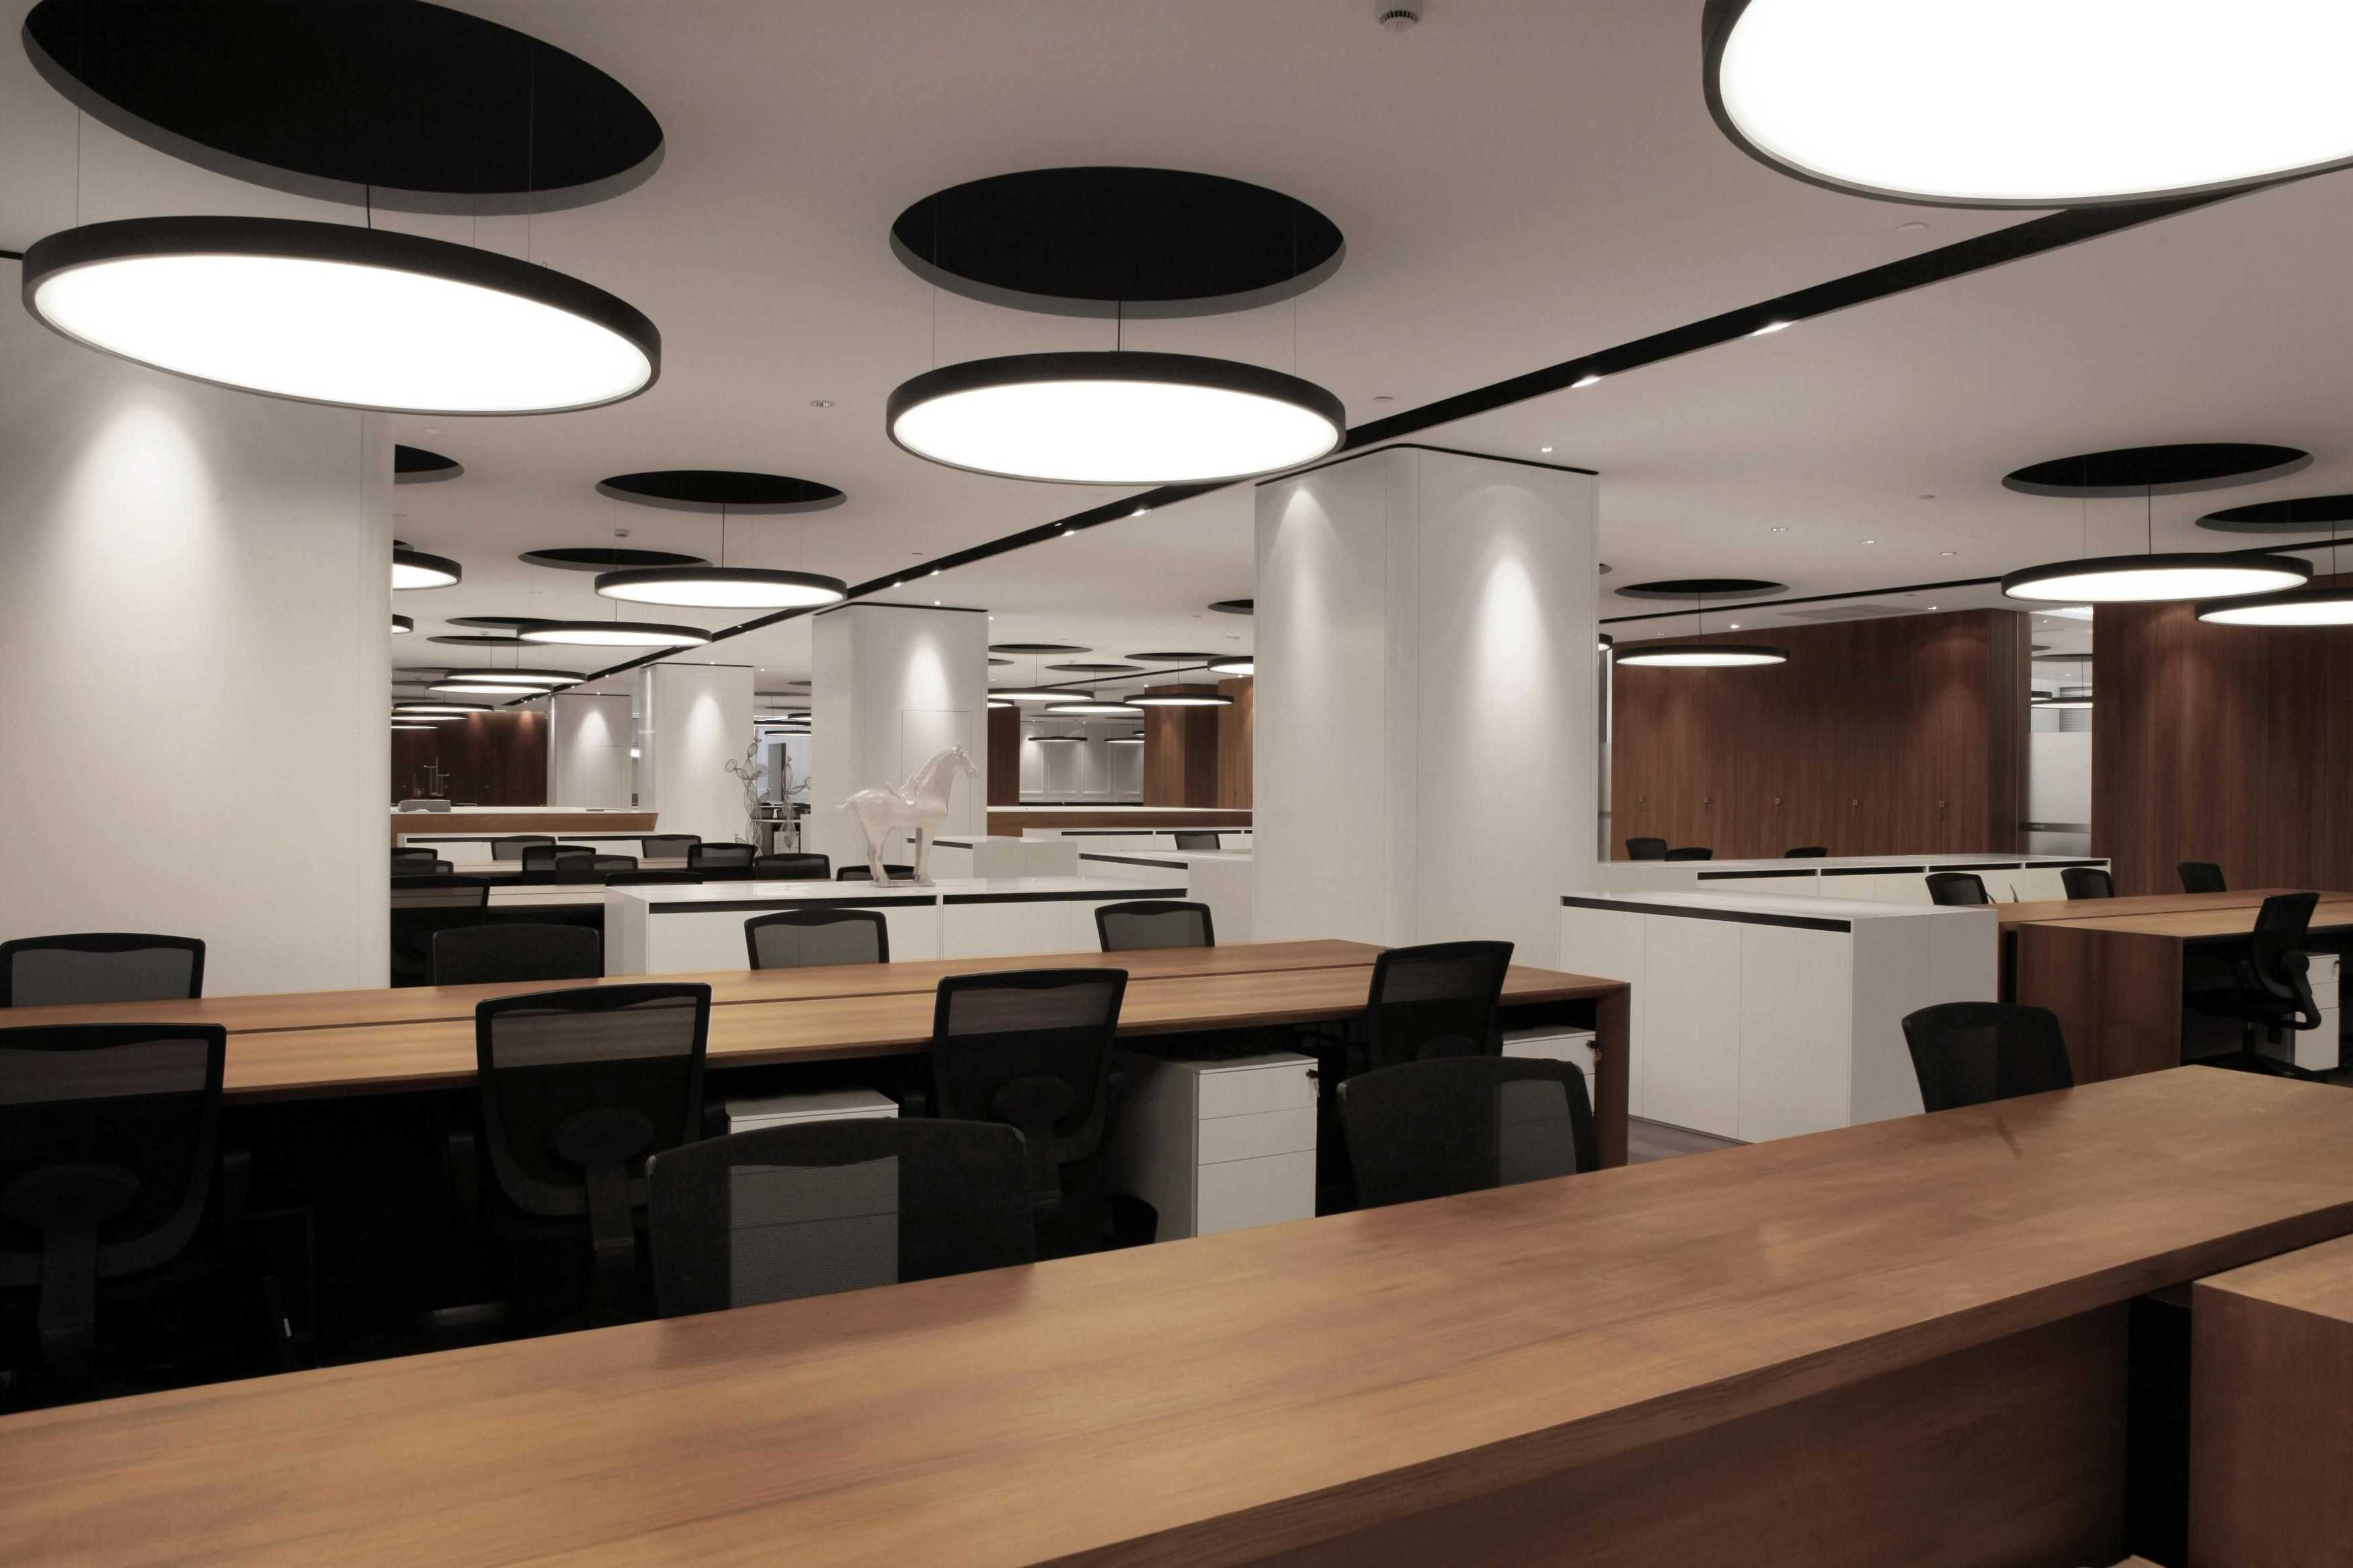 Bej.interior Office Jakarta, Daerah Khusus Ibukota Jakarta, Indonesia Jakarta, Daerah Khusus Ibukota Jakarta, Indonesia Office- Contemporary <P>Staff Area</p> 80484